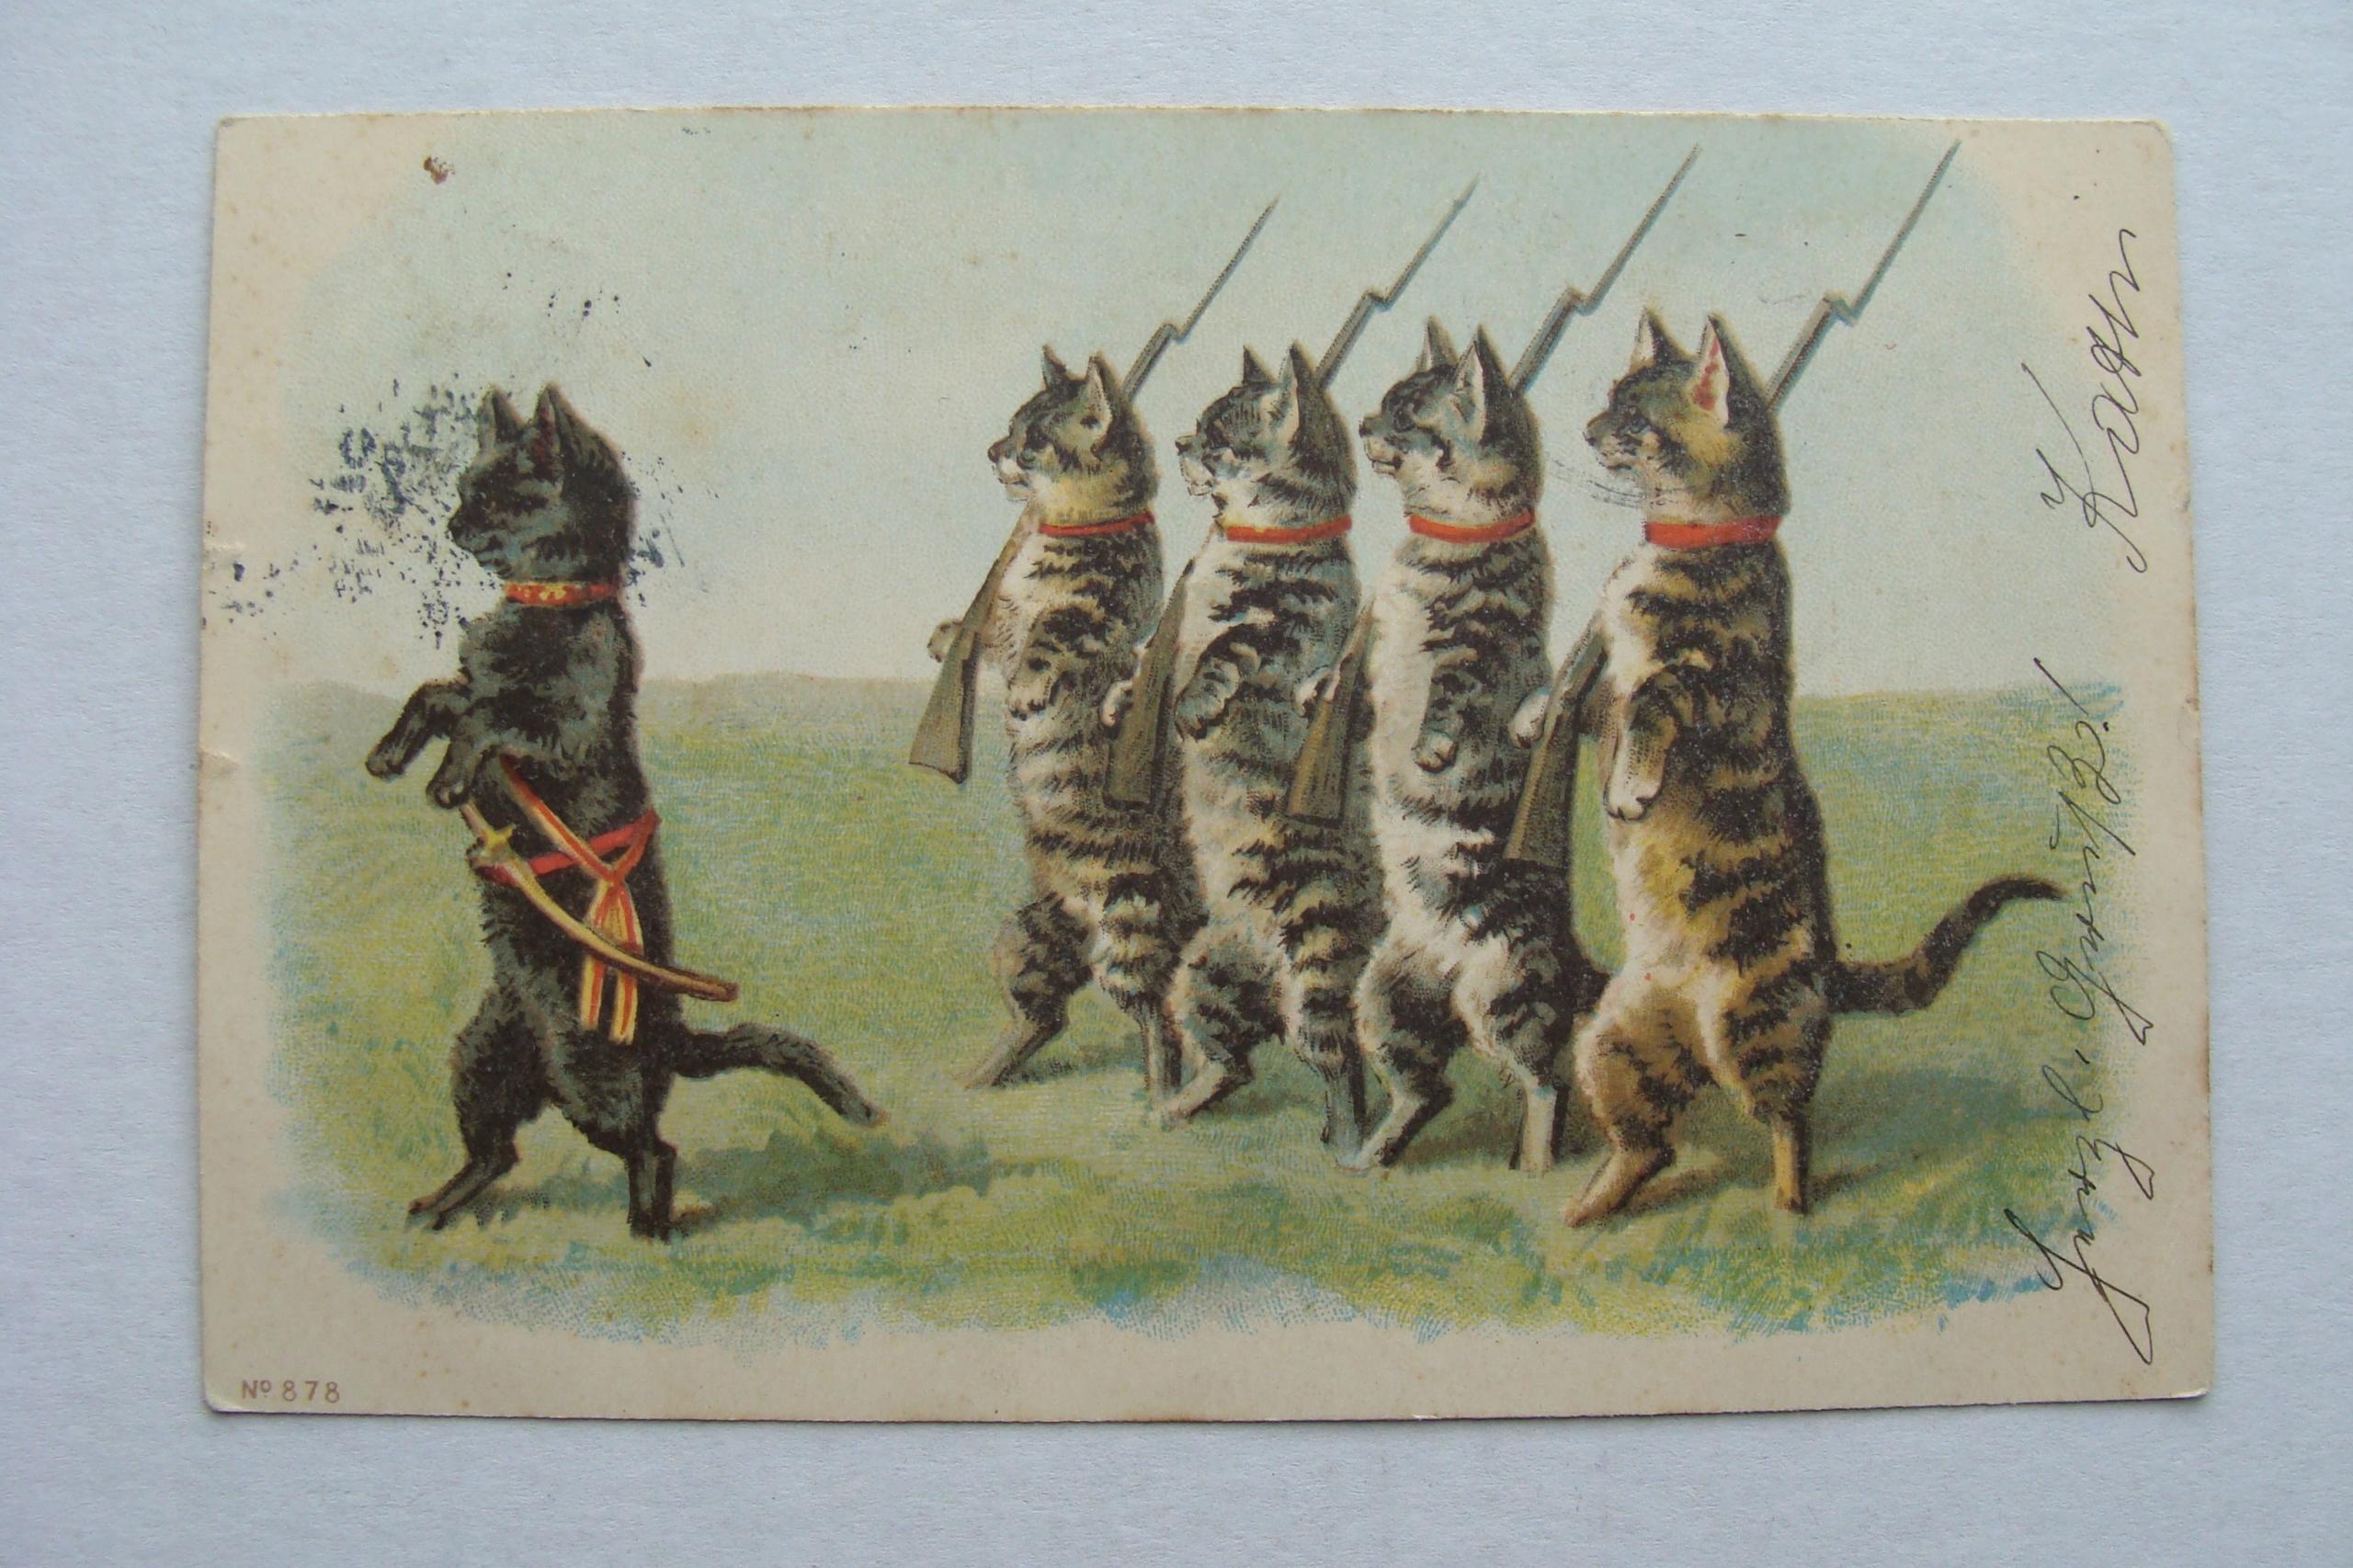 FUNNY CATS CAT KOTIE ARMY prew. ОТКРЫТКА